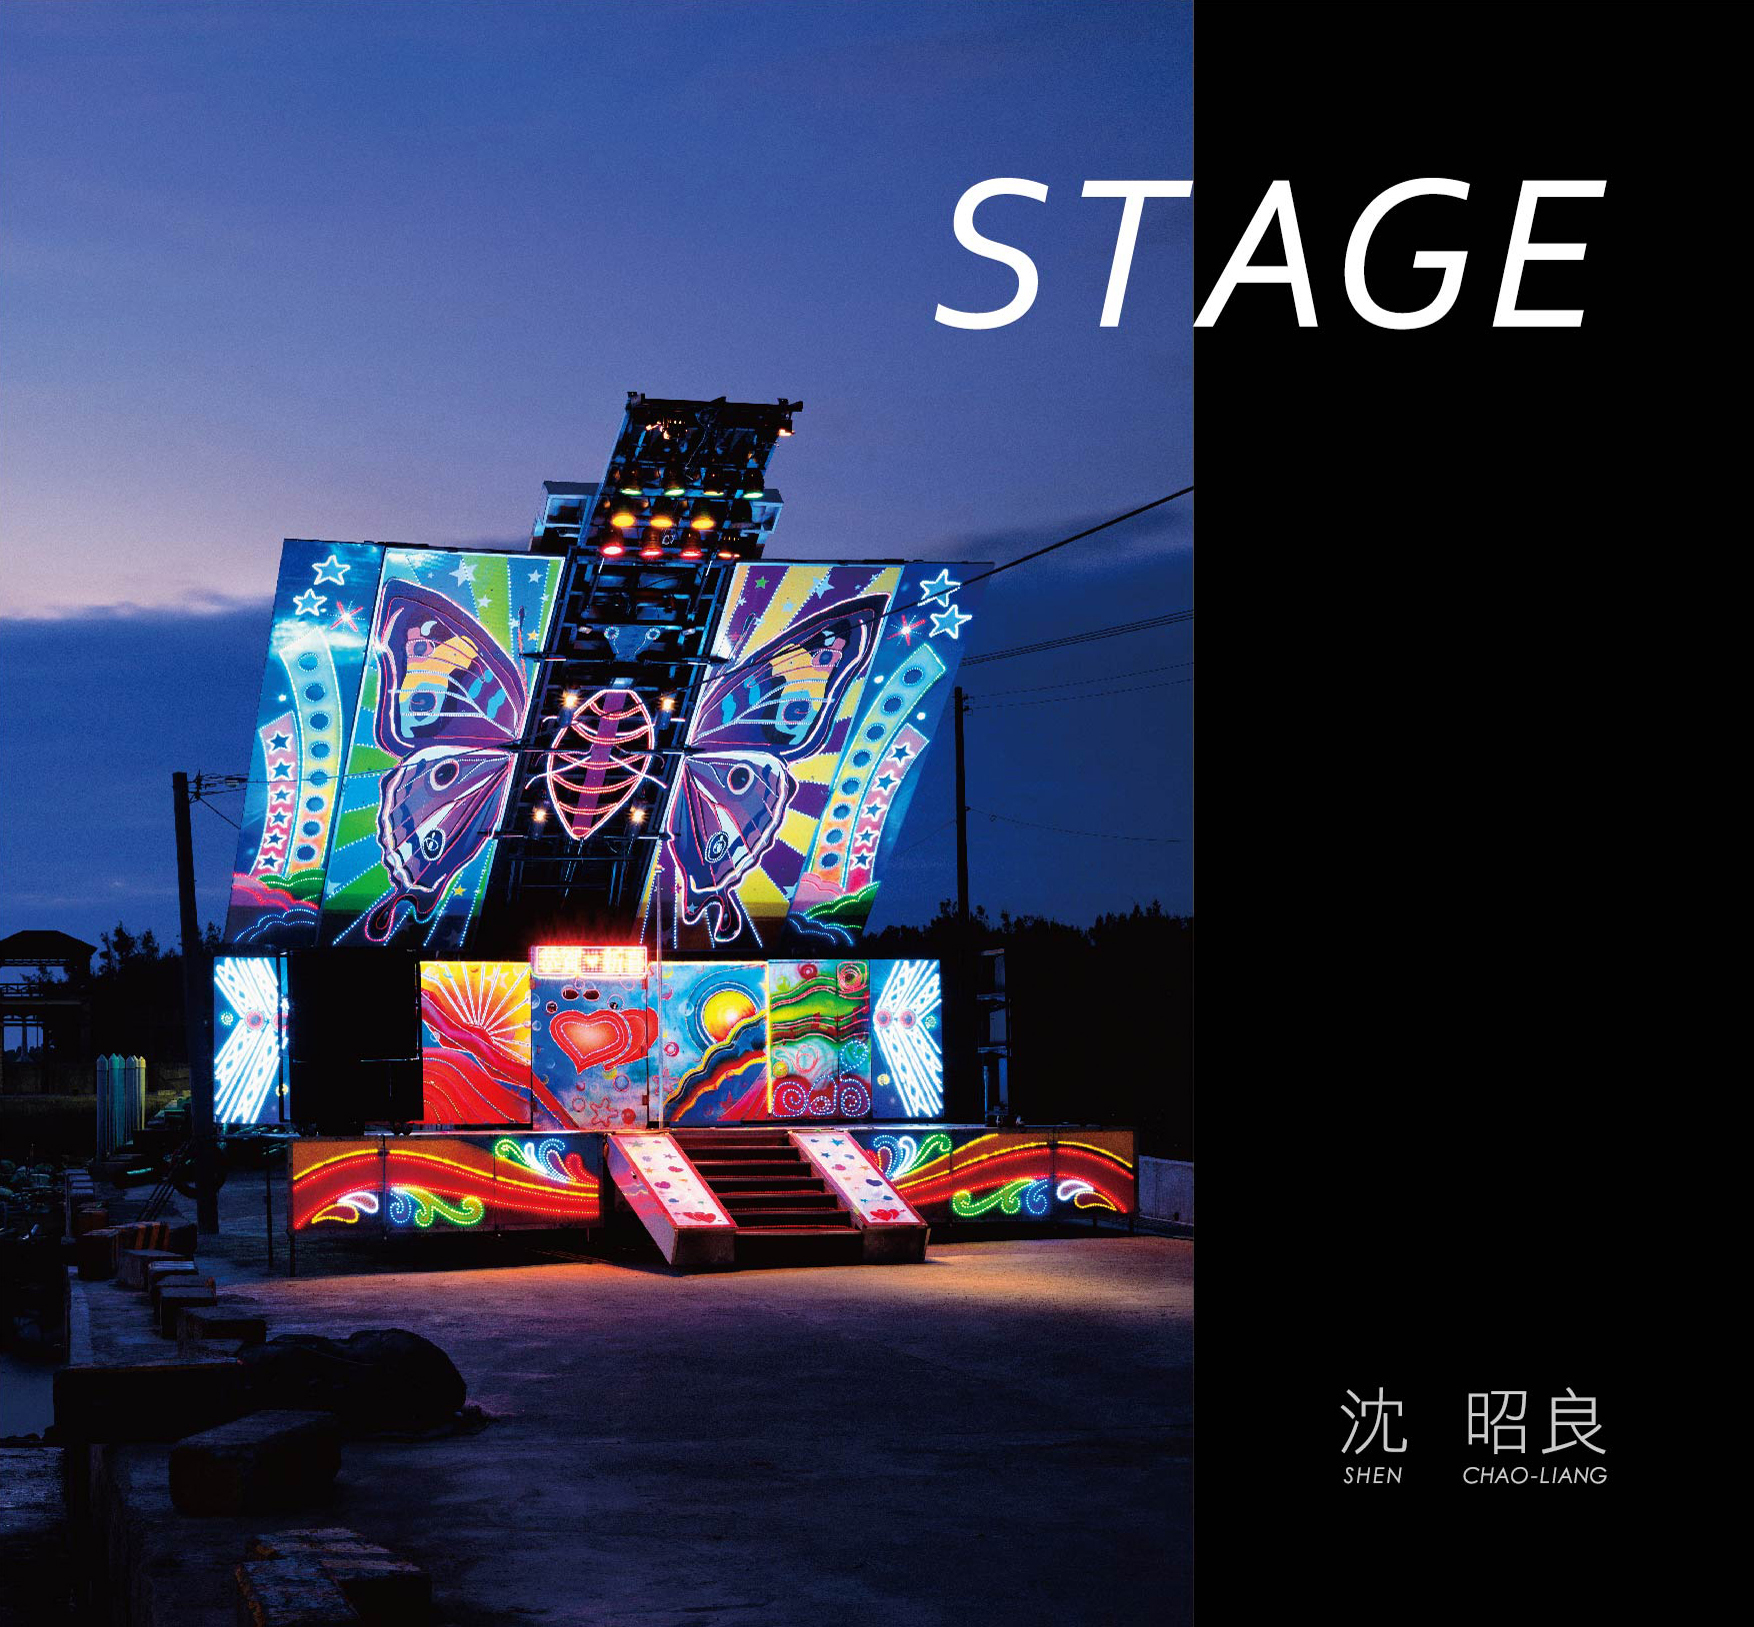 《STAGE》 - by 沈昭良《STAGE》攝影集,為自2006年至2011年期間,沈昭良於全台各地,所攝「STAGE」(舞台車)系列作品中挑選編輯而成。針對台灣特有的移動式舞台車,以當代攝影形式進行視覺書寫的作品彙編。共計收錄62件作品,採中、英、日文對照,高精細度印刷。(摘自 沈昭良官方網站)